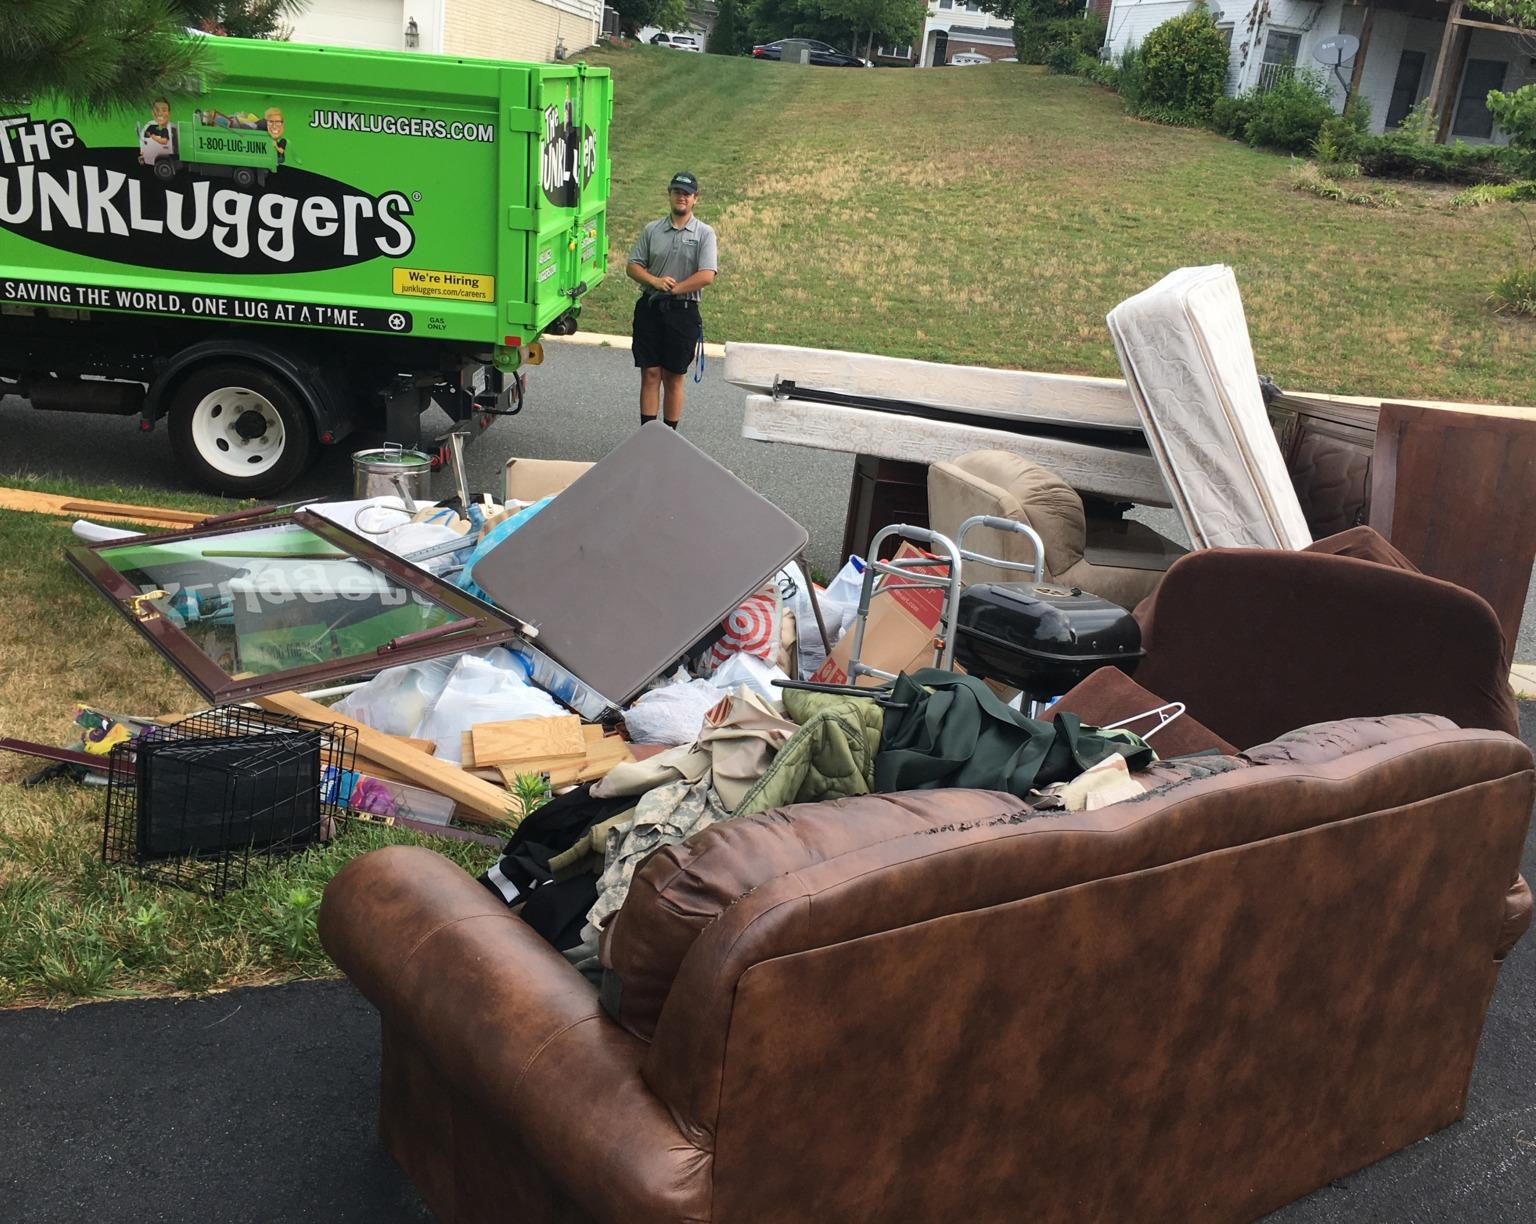 Curbside junk removal in Woodbridge, VA - Before Photo